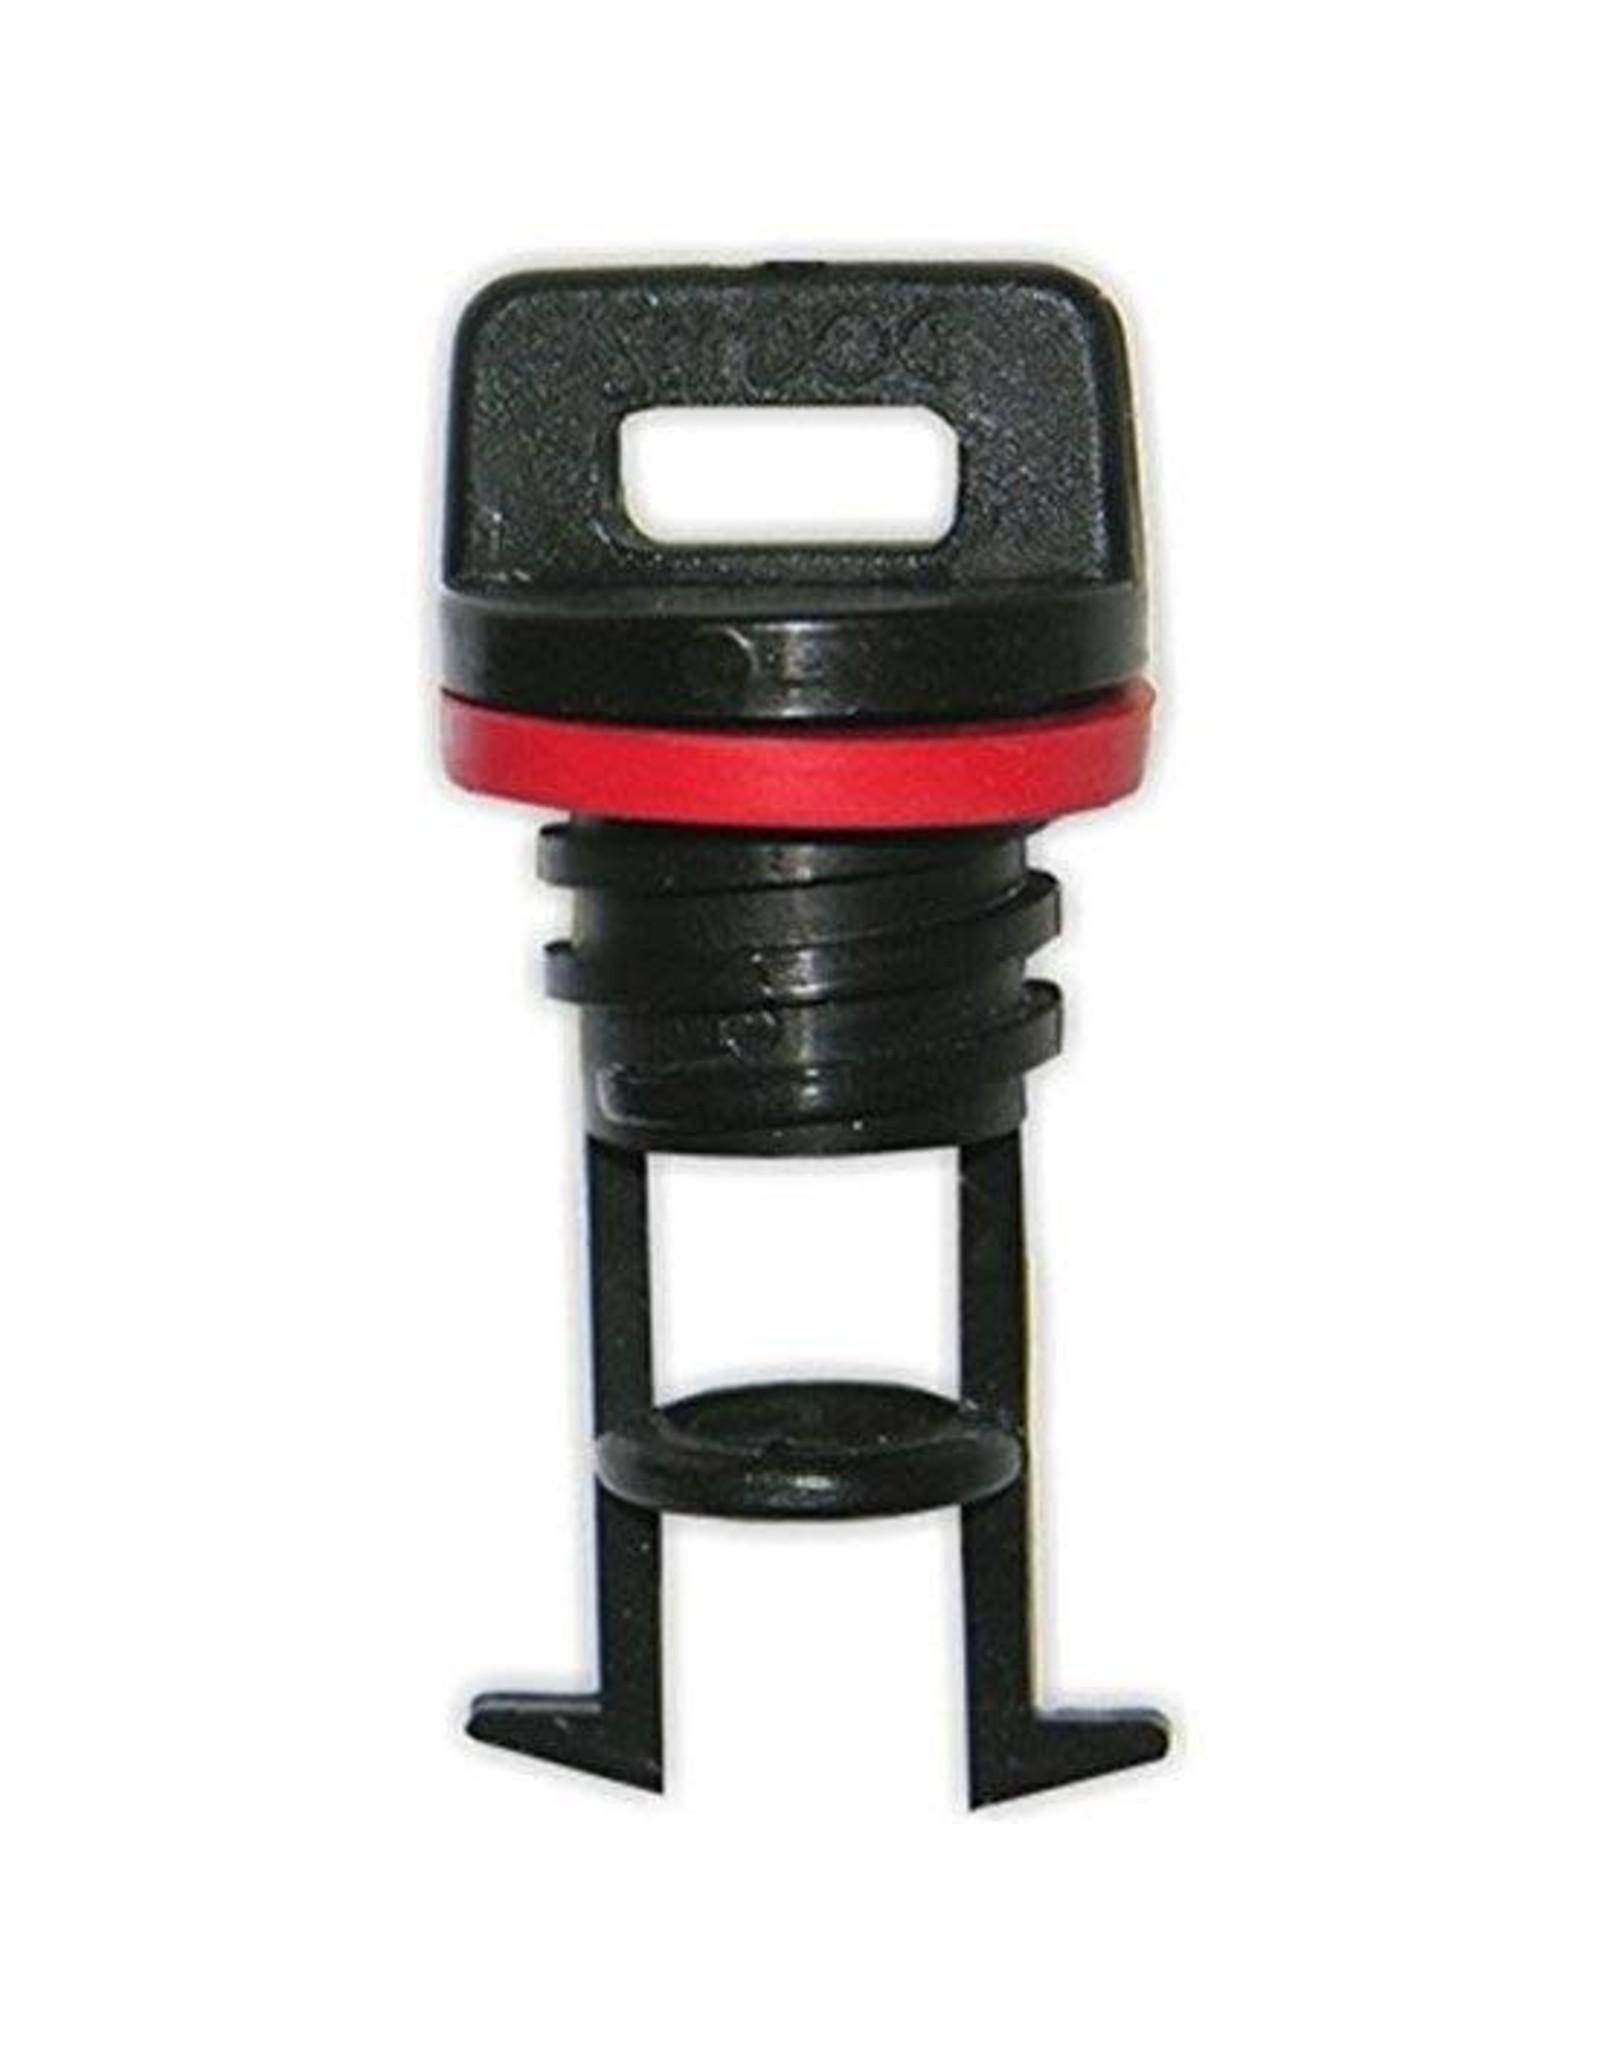 Drain Plug- Course with Port, Plastic, Blk